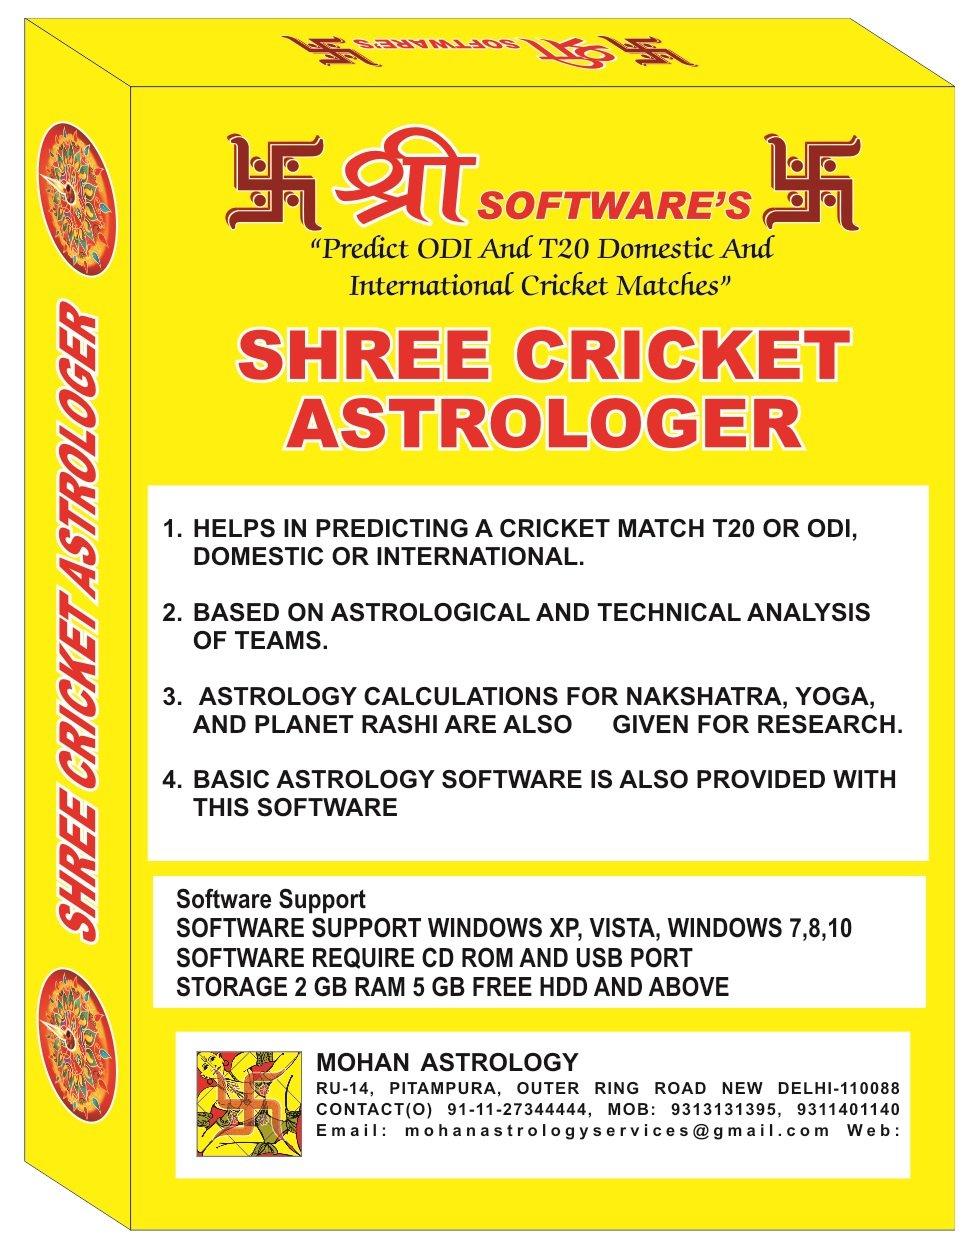 Freeware download: winstar matrix astrology software.